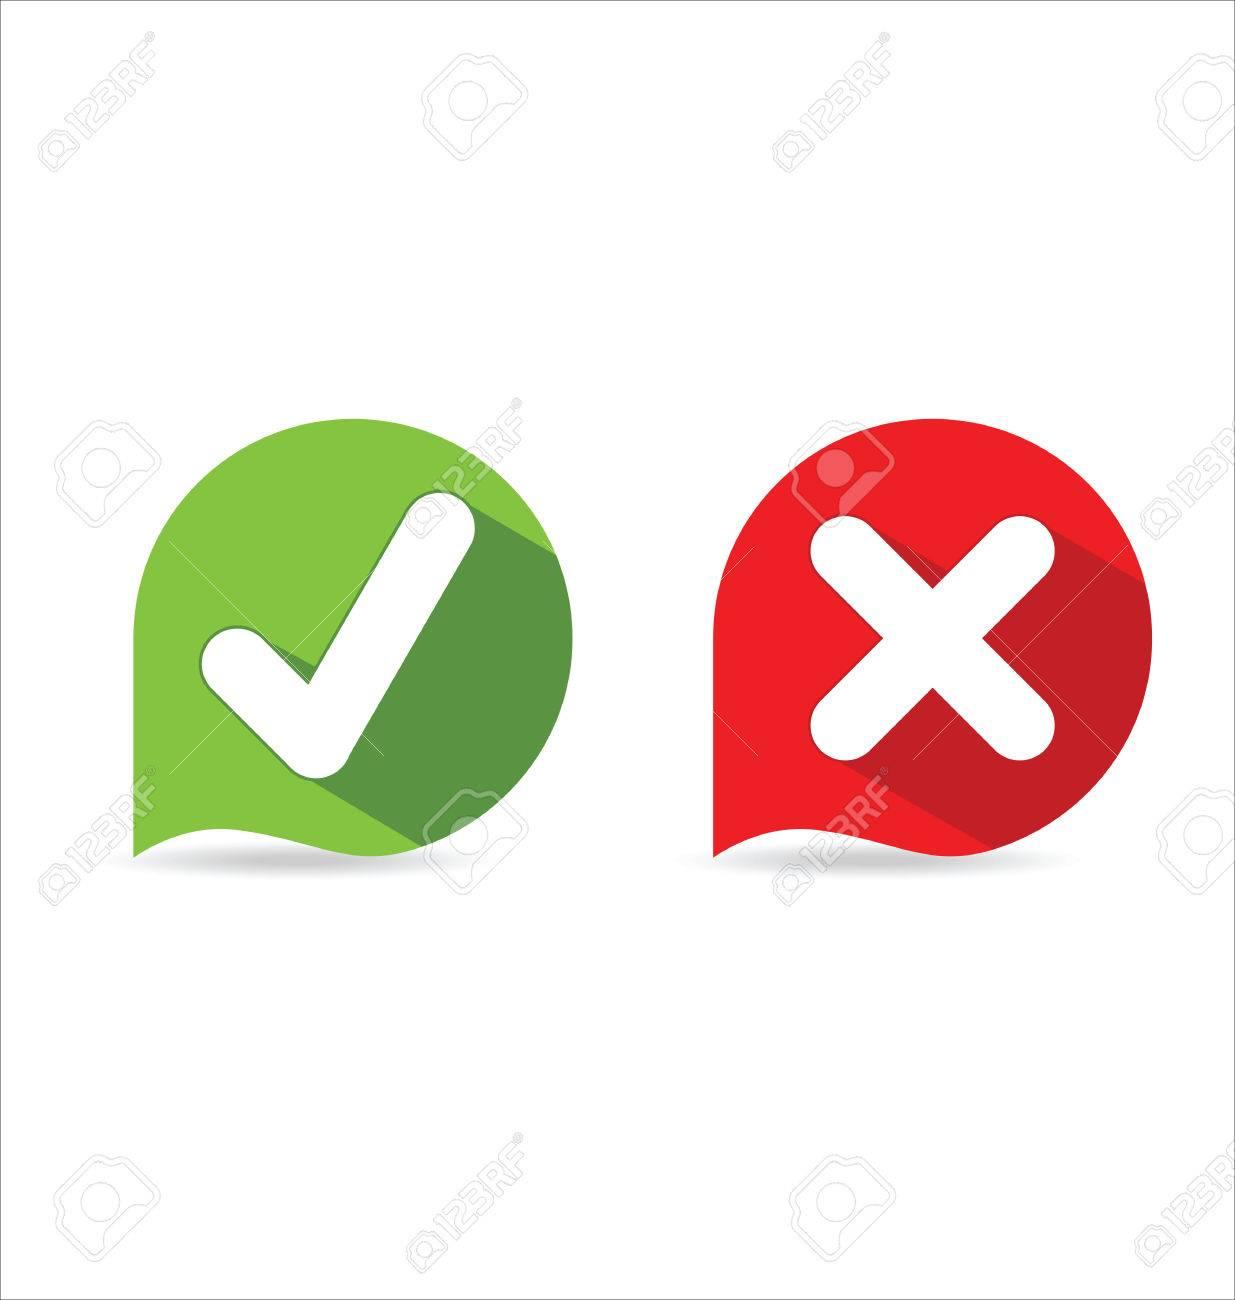 Modern Check Mark Icons Royalty Free Cliparts Vectors And Stock